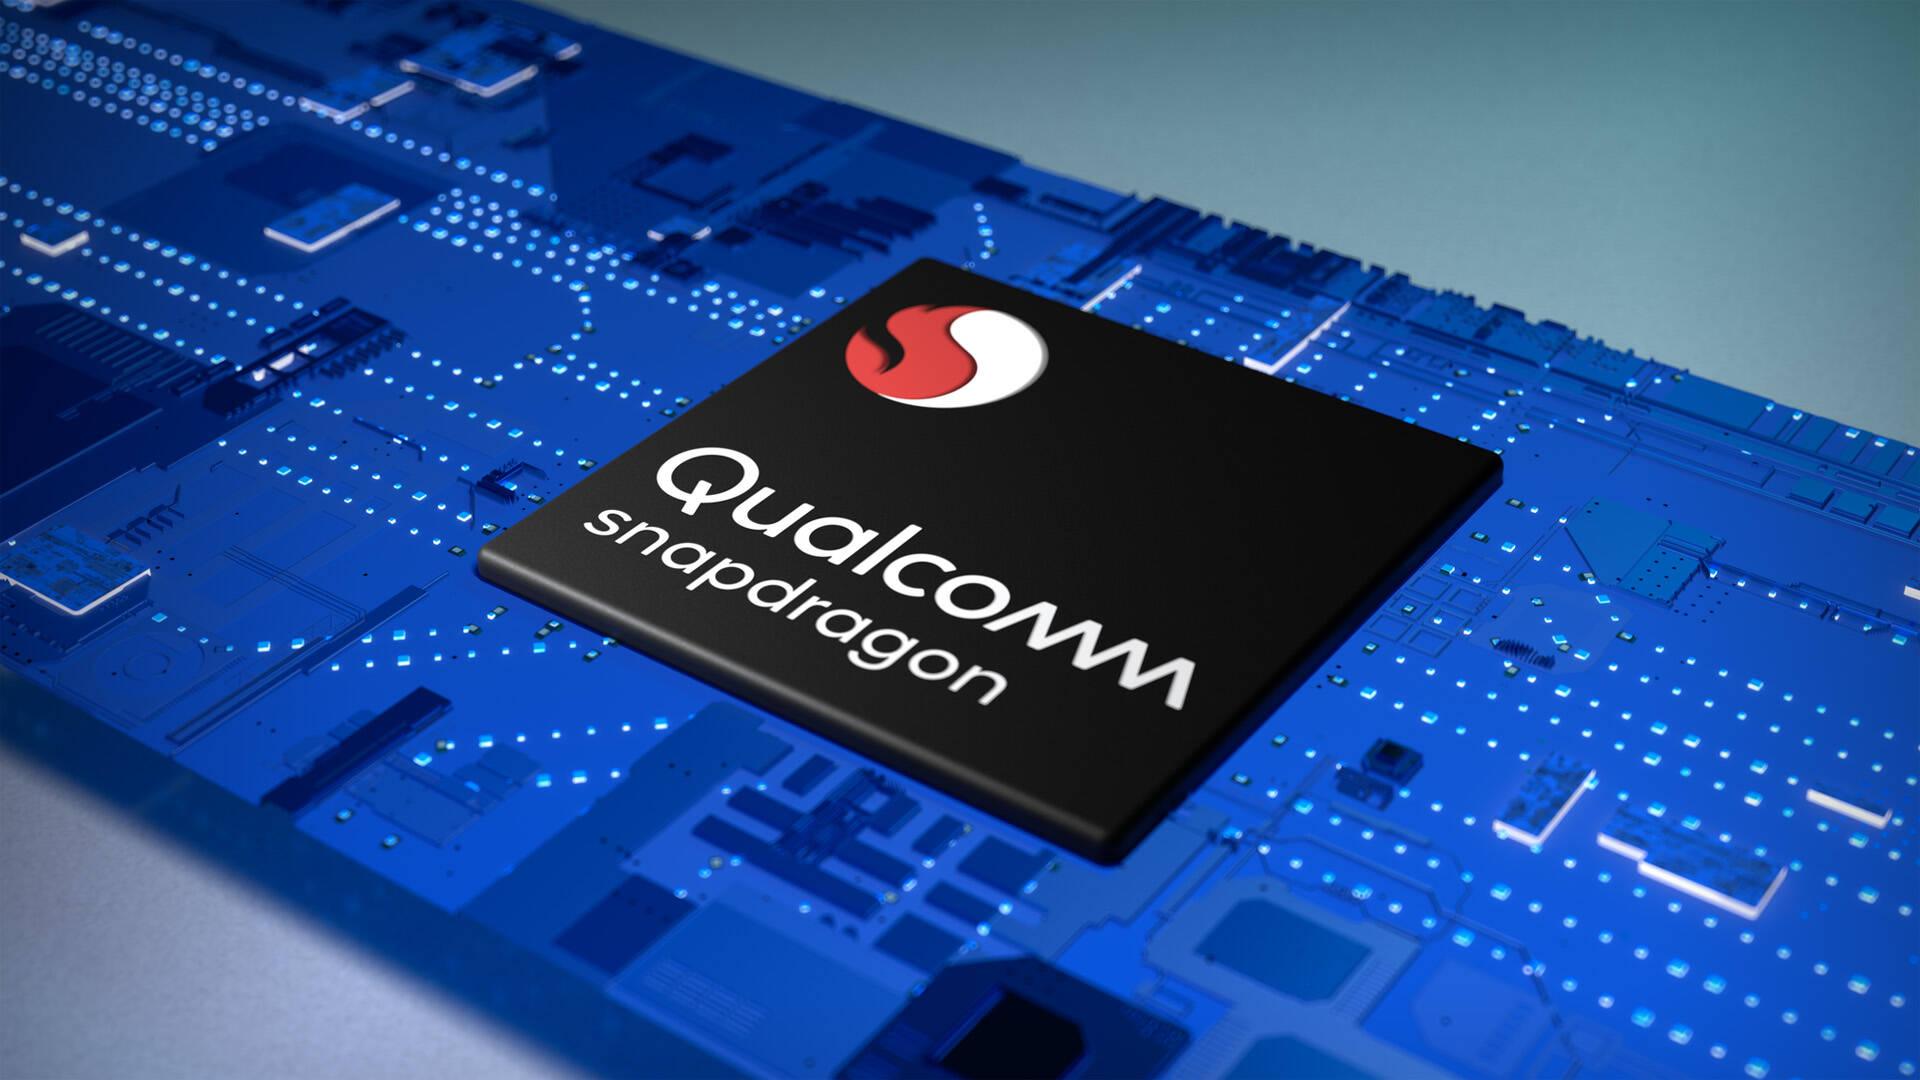 Qualcomm Snapdragon Platform